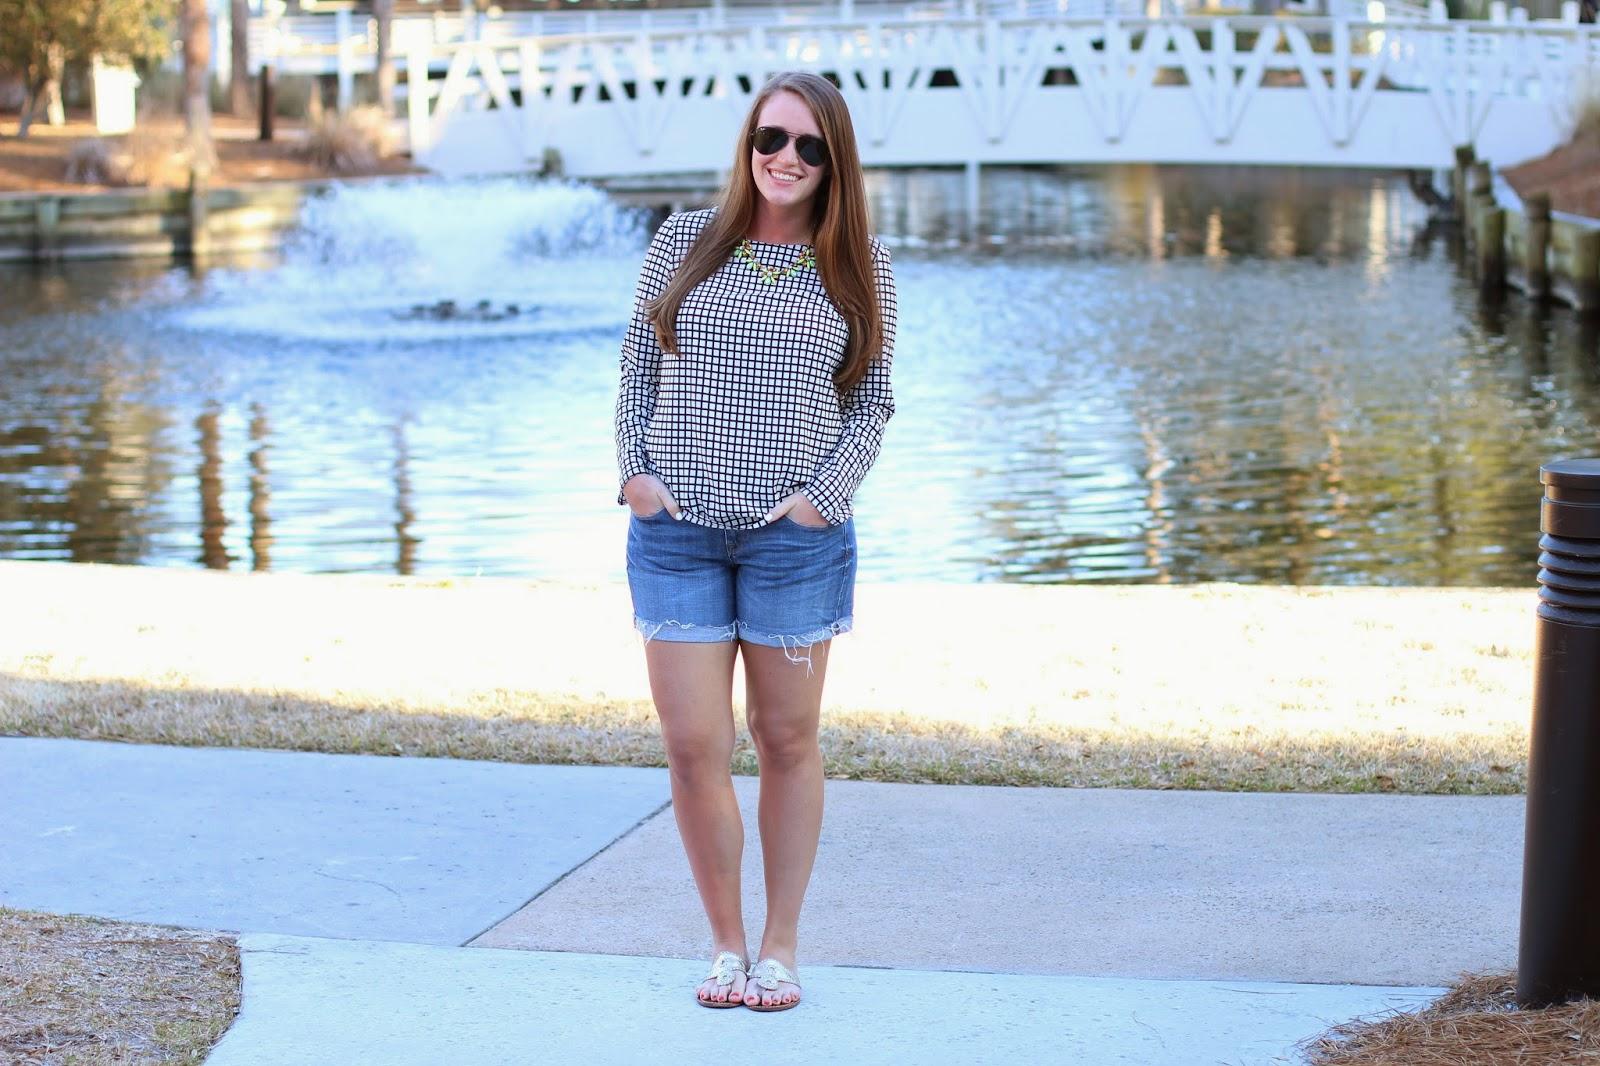 Toned Legs Vs Untoned Legs Here s to un-toned and sunUntoned Stomach Vs Toned